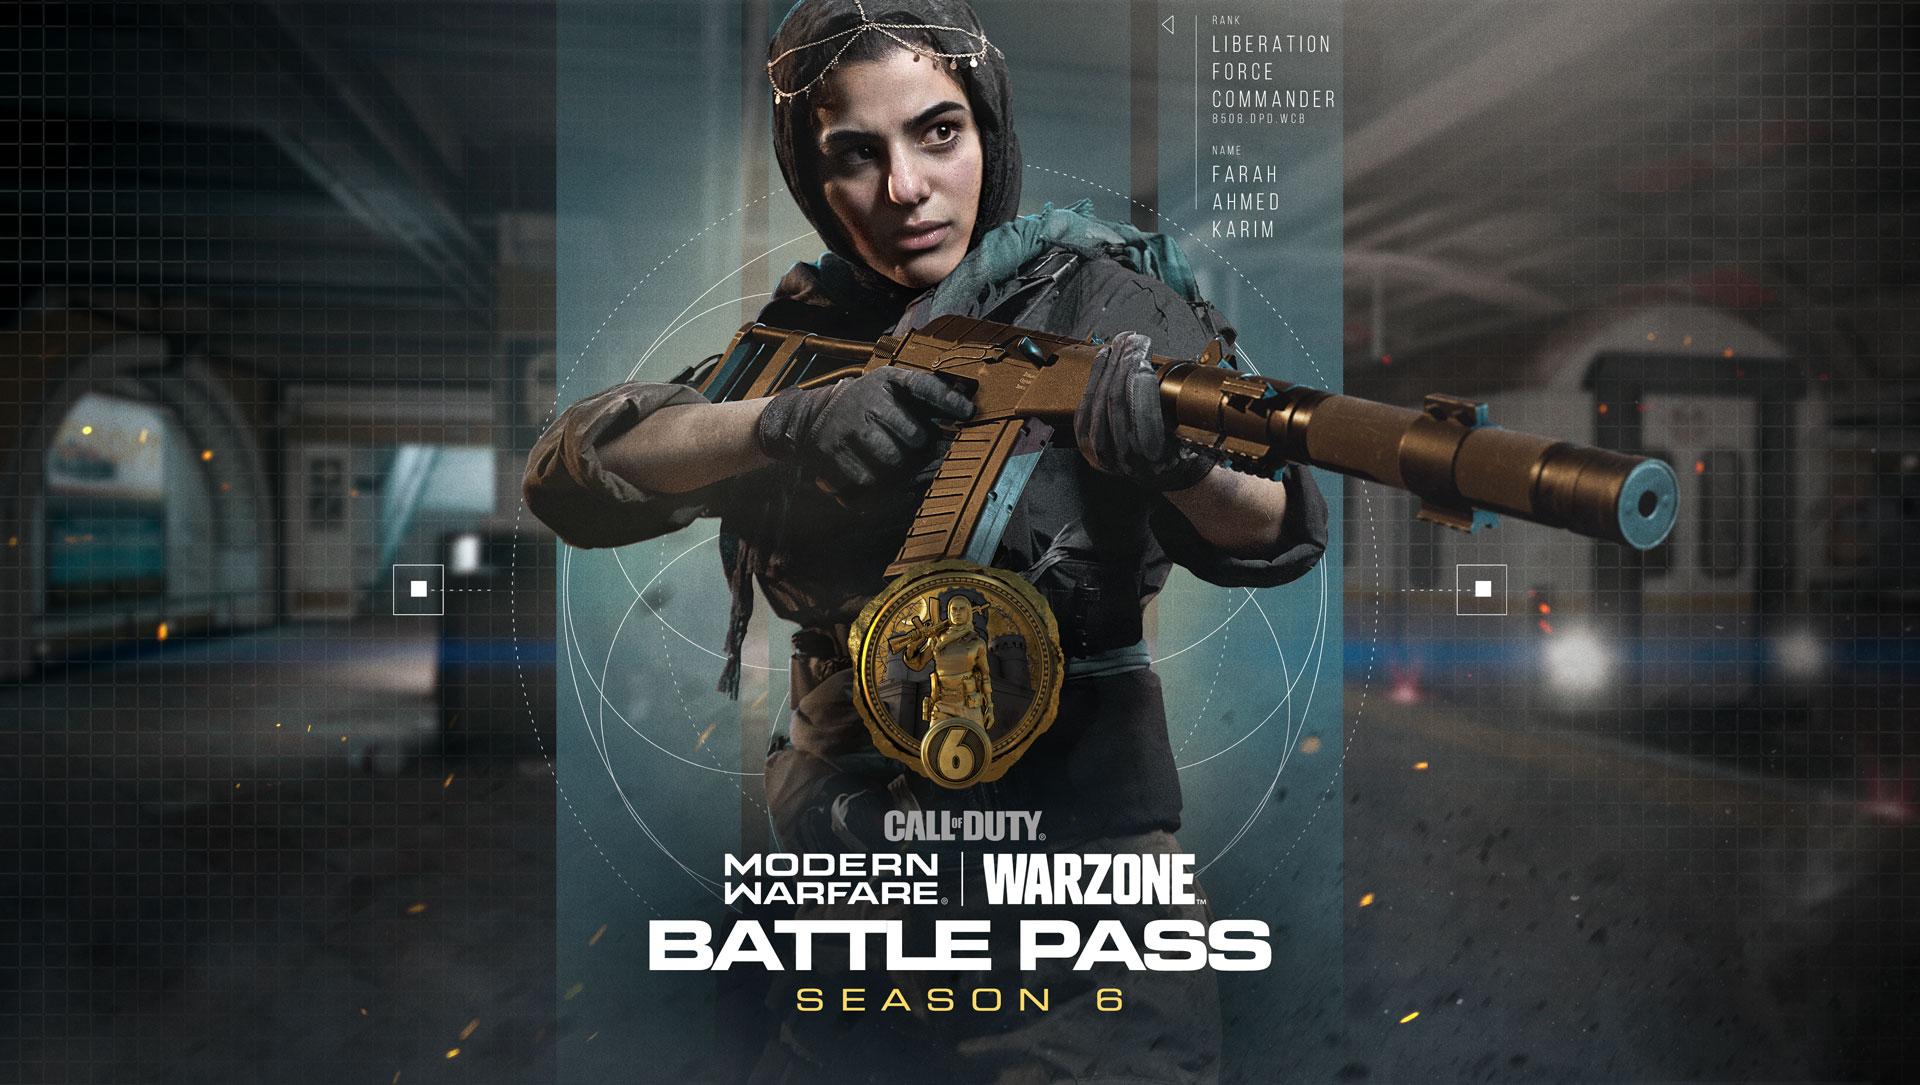 Modern Warfare Season 6 Battle Pass 100 Tiers Rewards Price More Dexerto